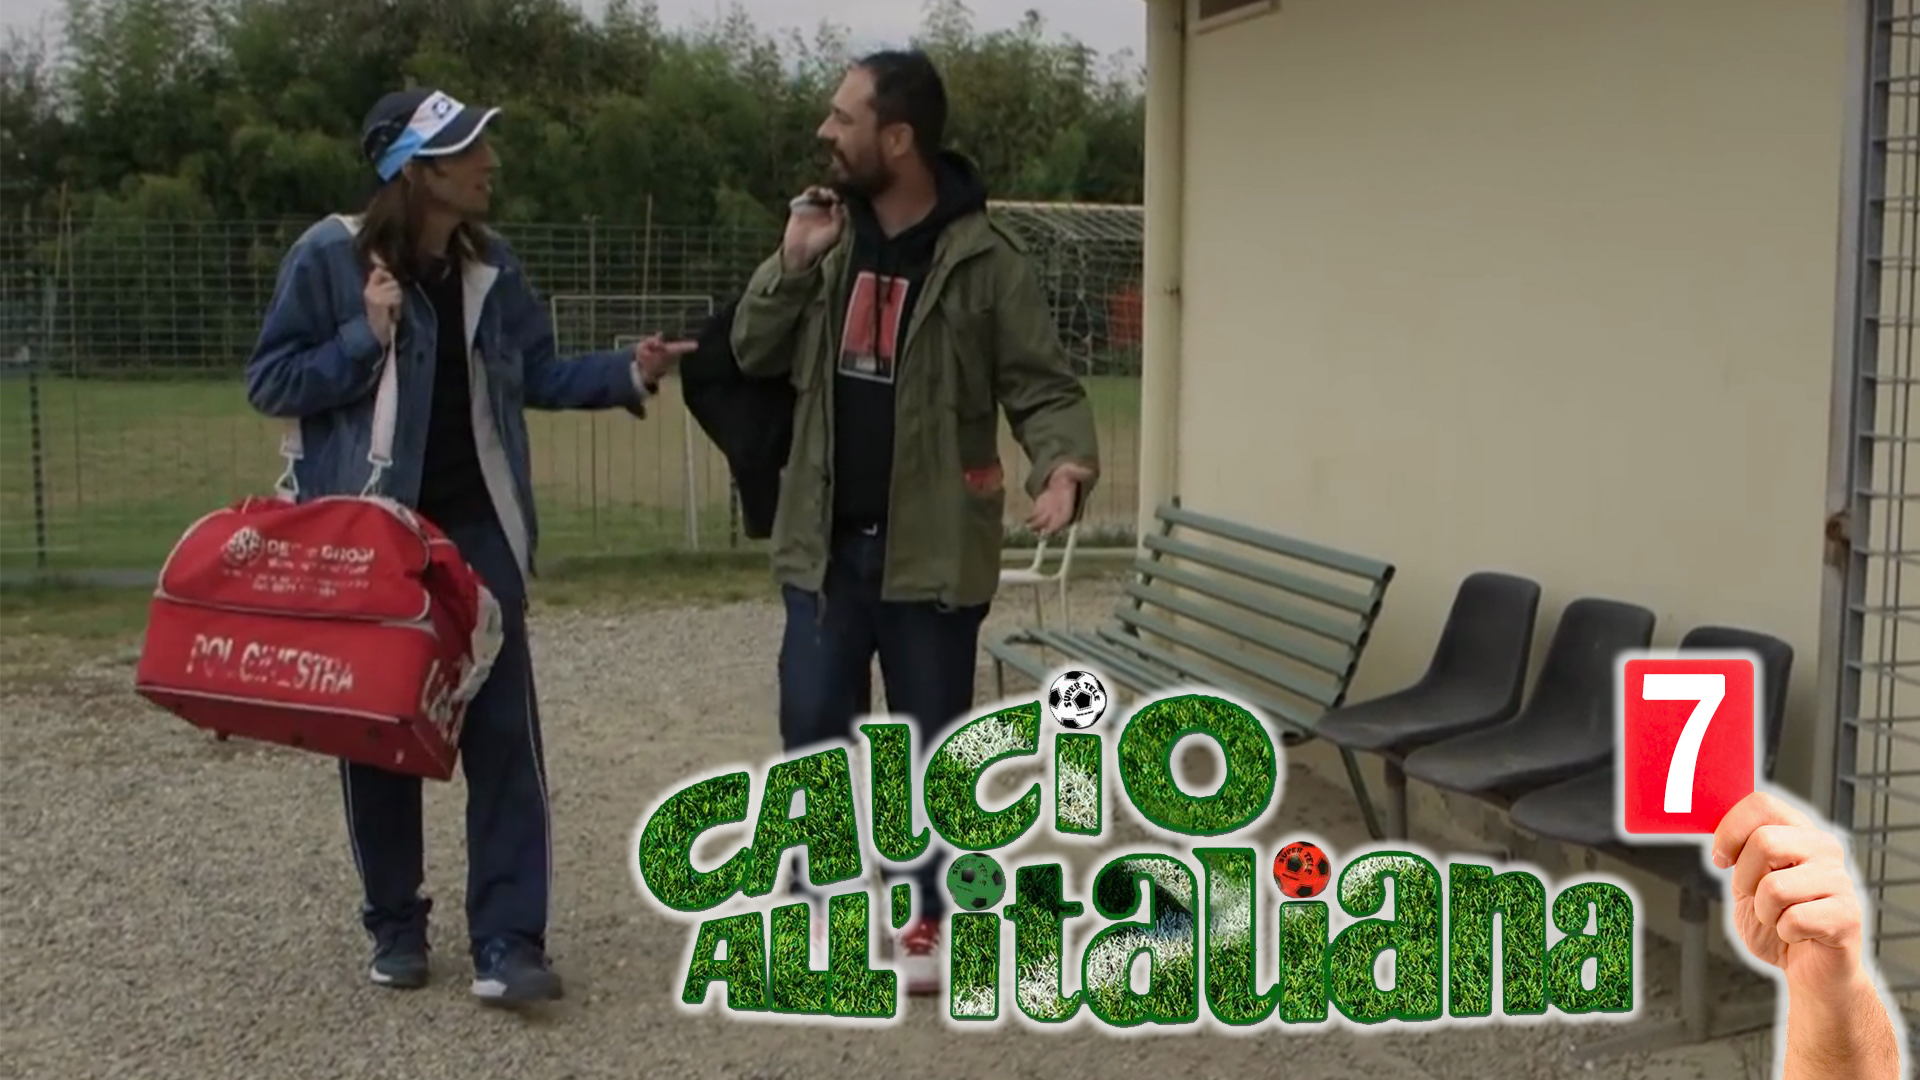 Calcio all'italiana – puntata 7